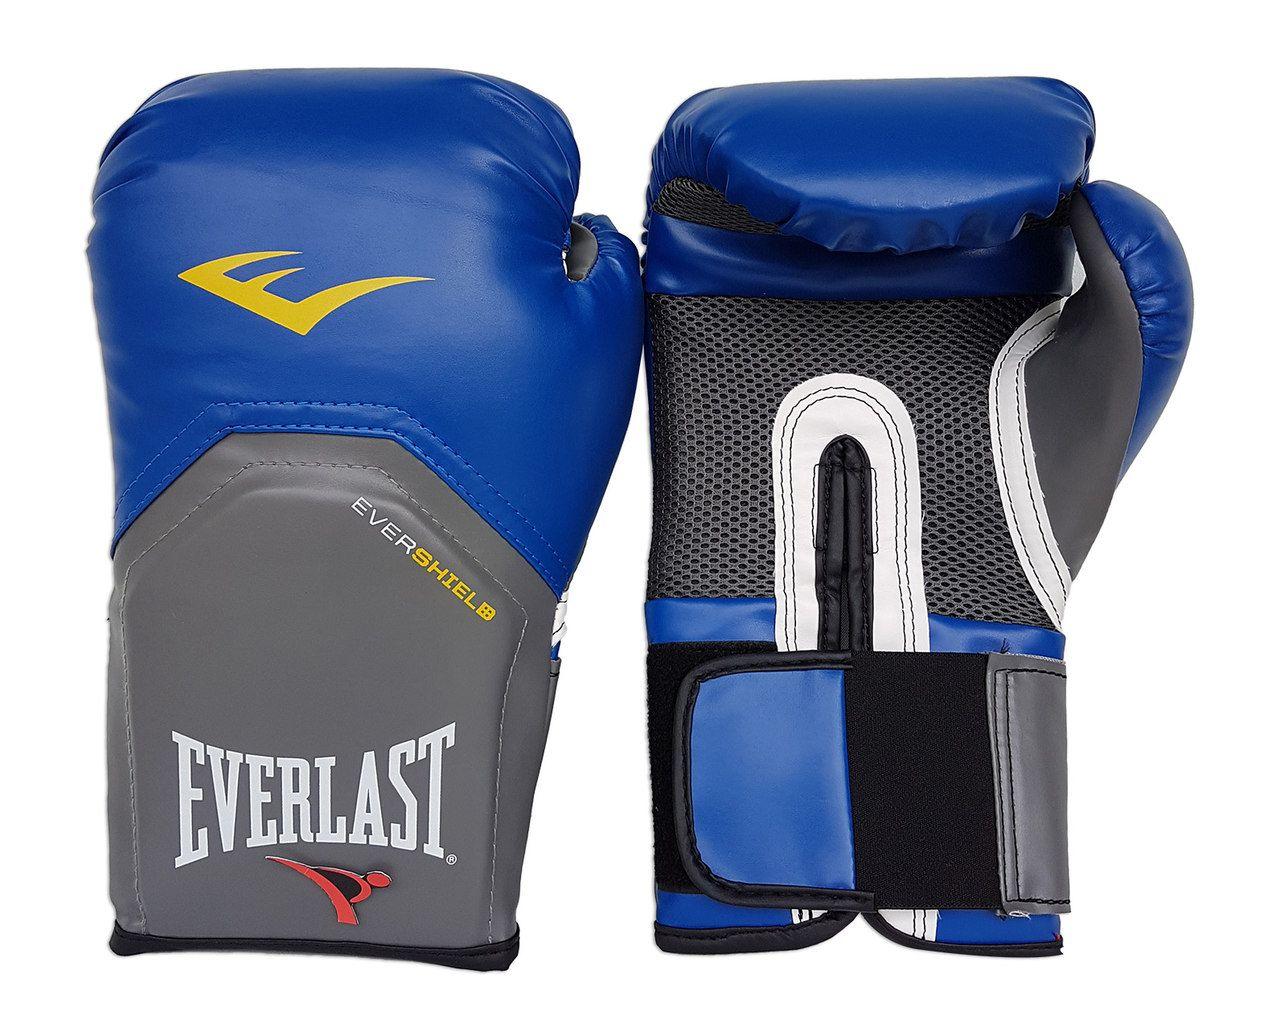 Kit de Boxe / Muay Thai 14oz - Azul - Pro Style - Everlast  - PRALUTA SHOP